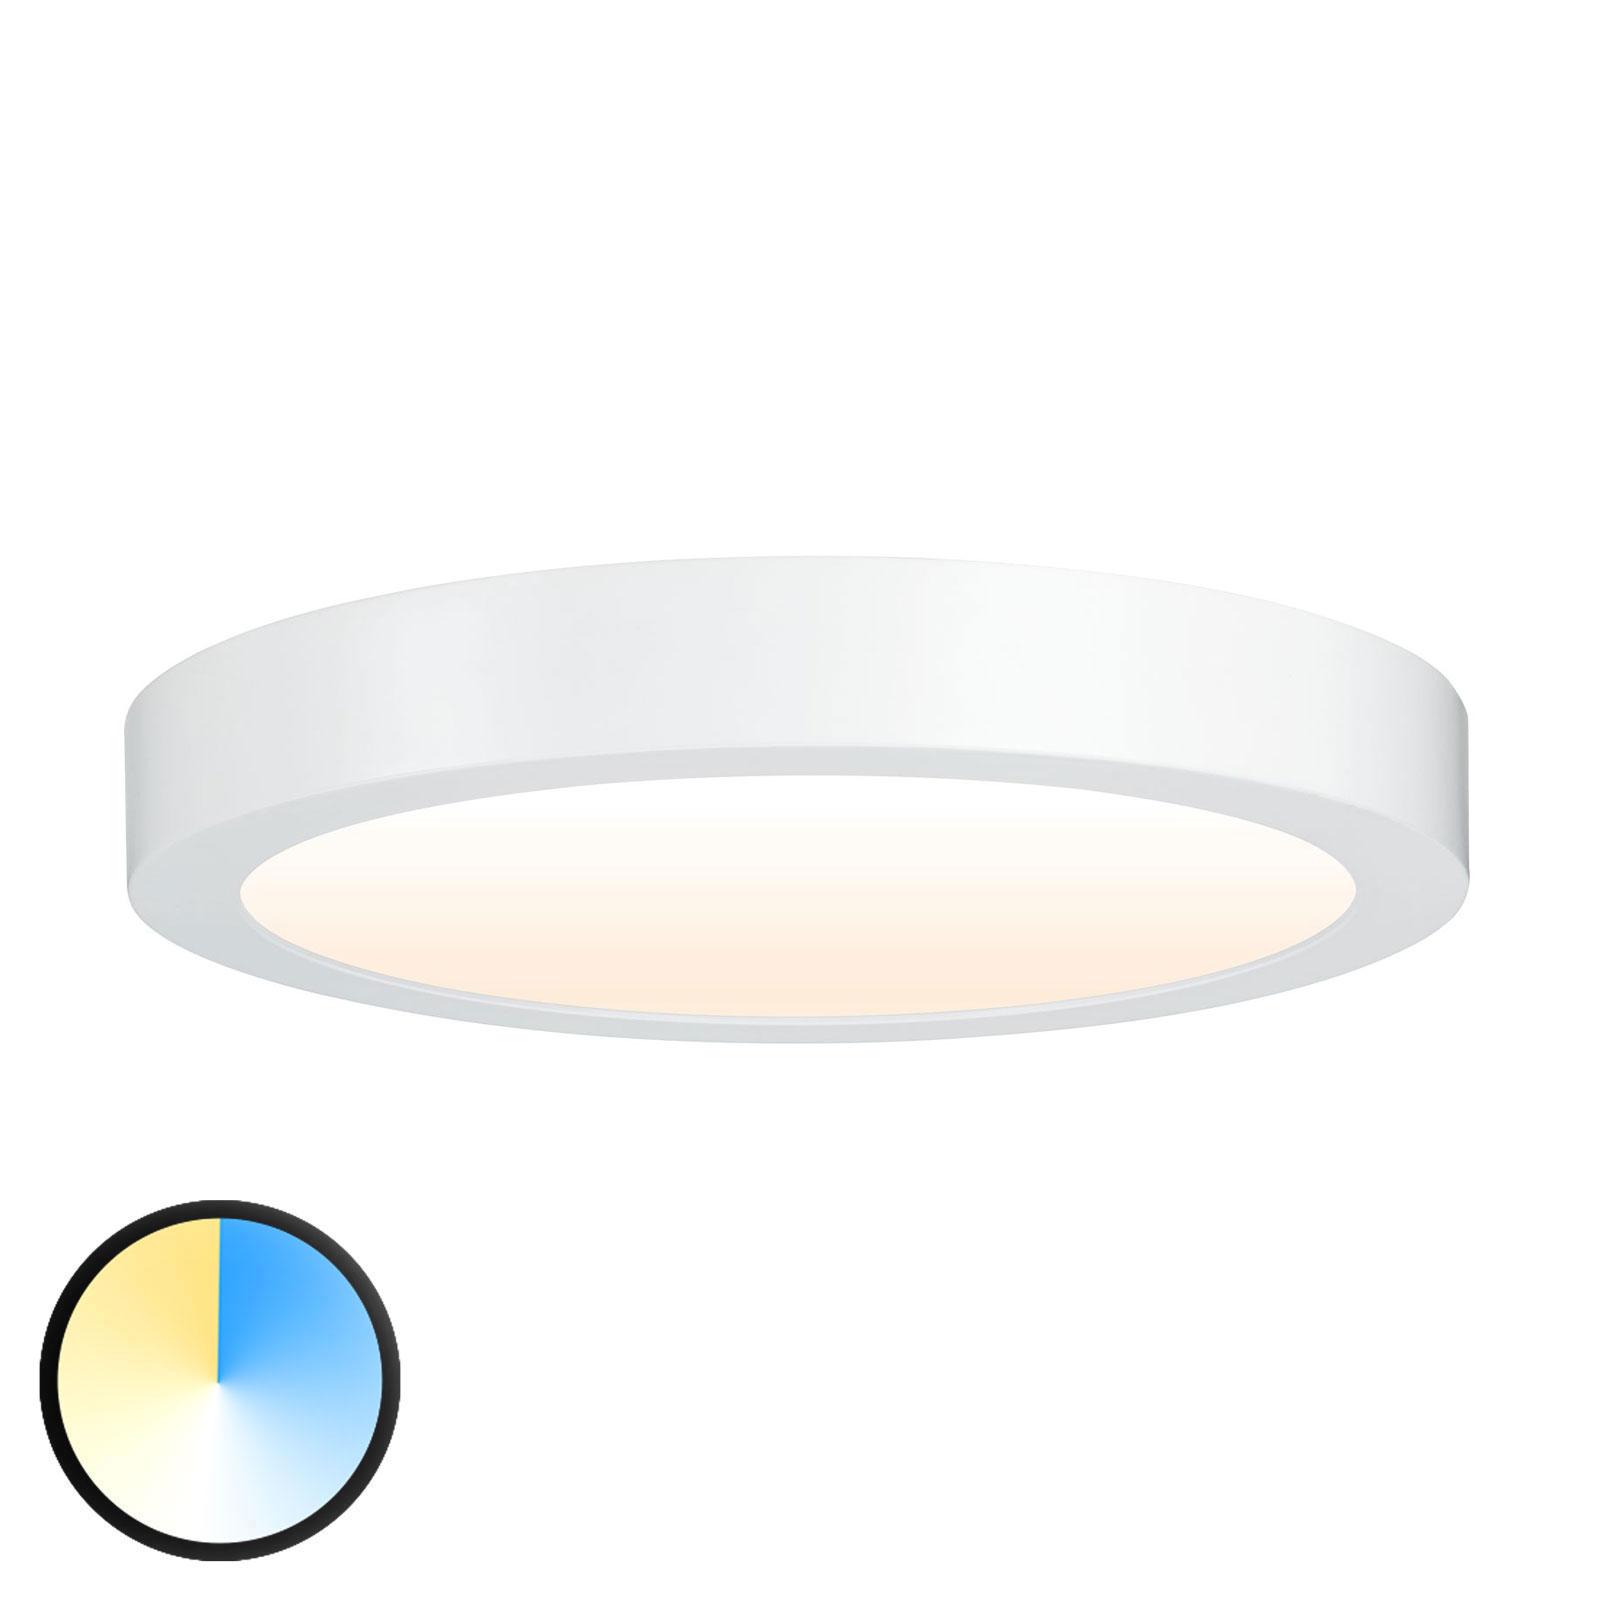 Paulmann Carpo lampa sufitowa LED biała 30cm